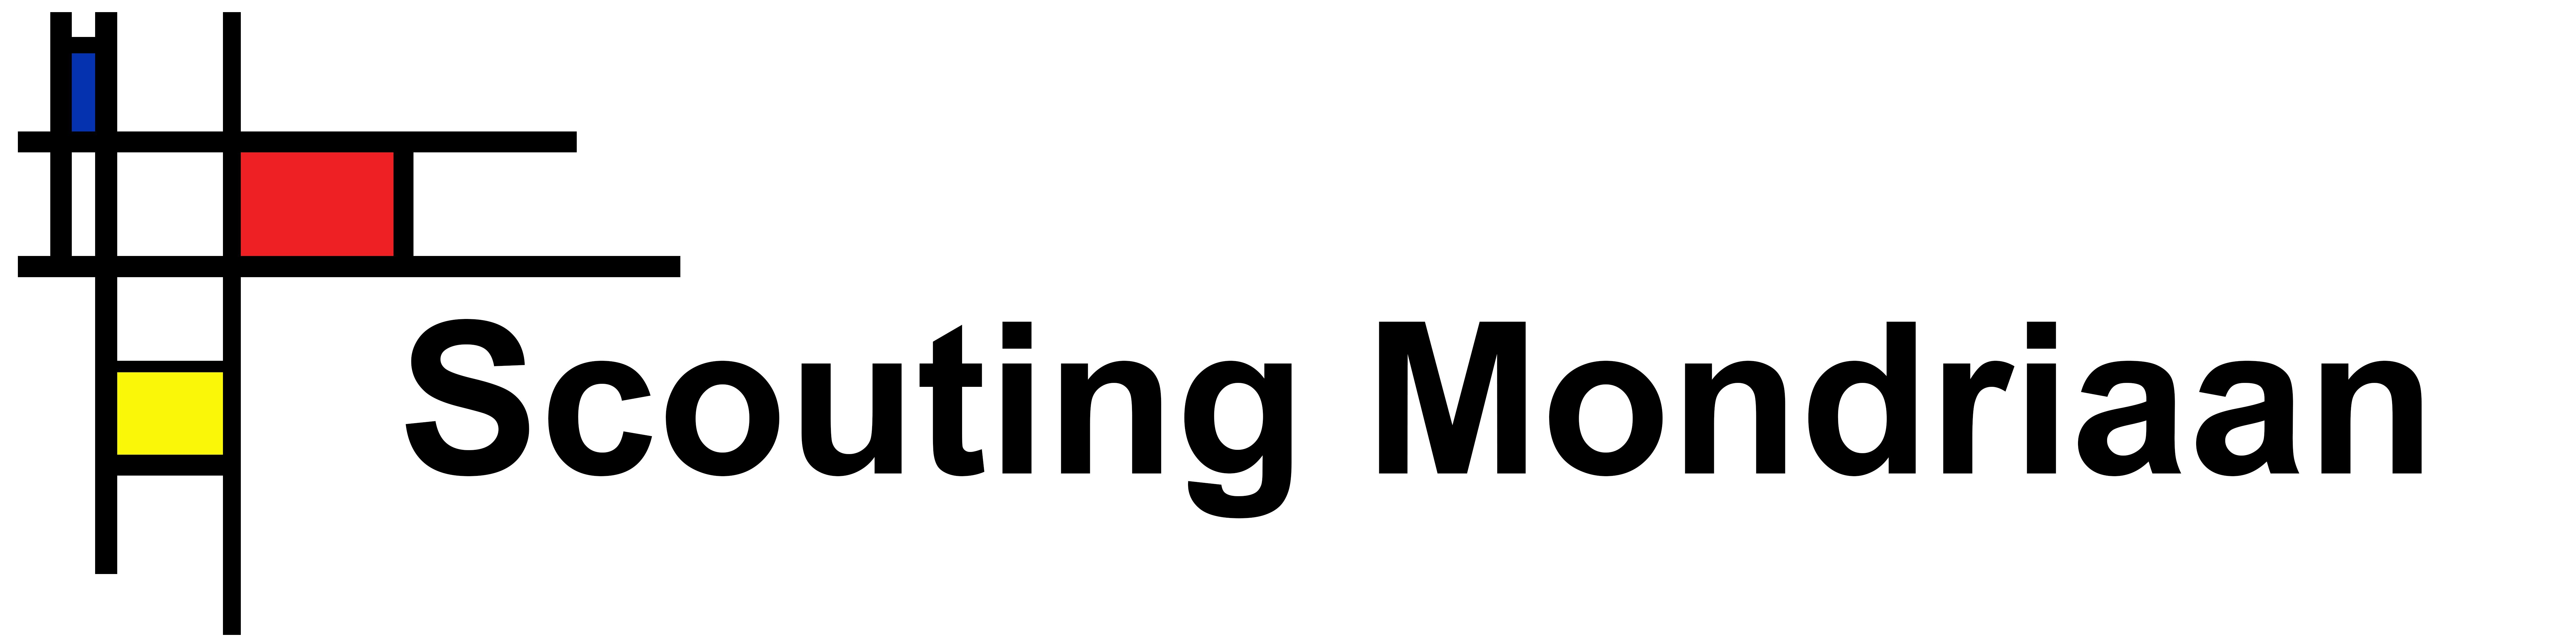 Scouting Mondriaan